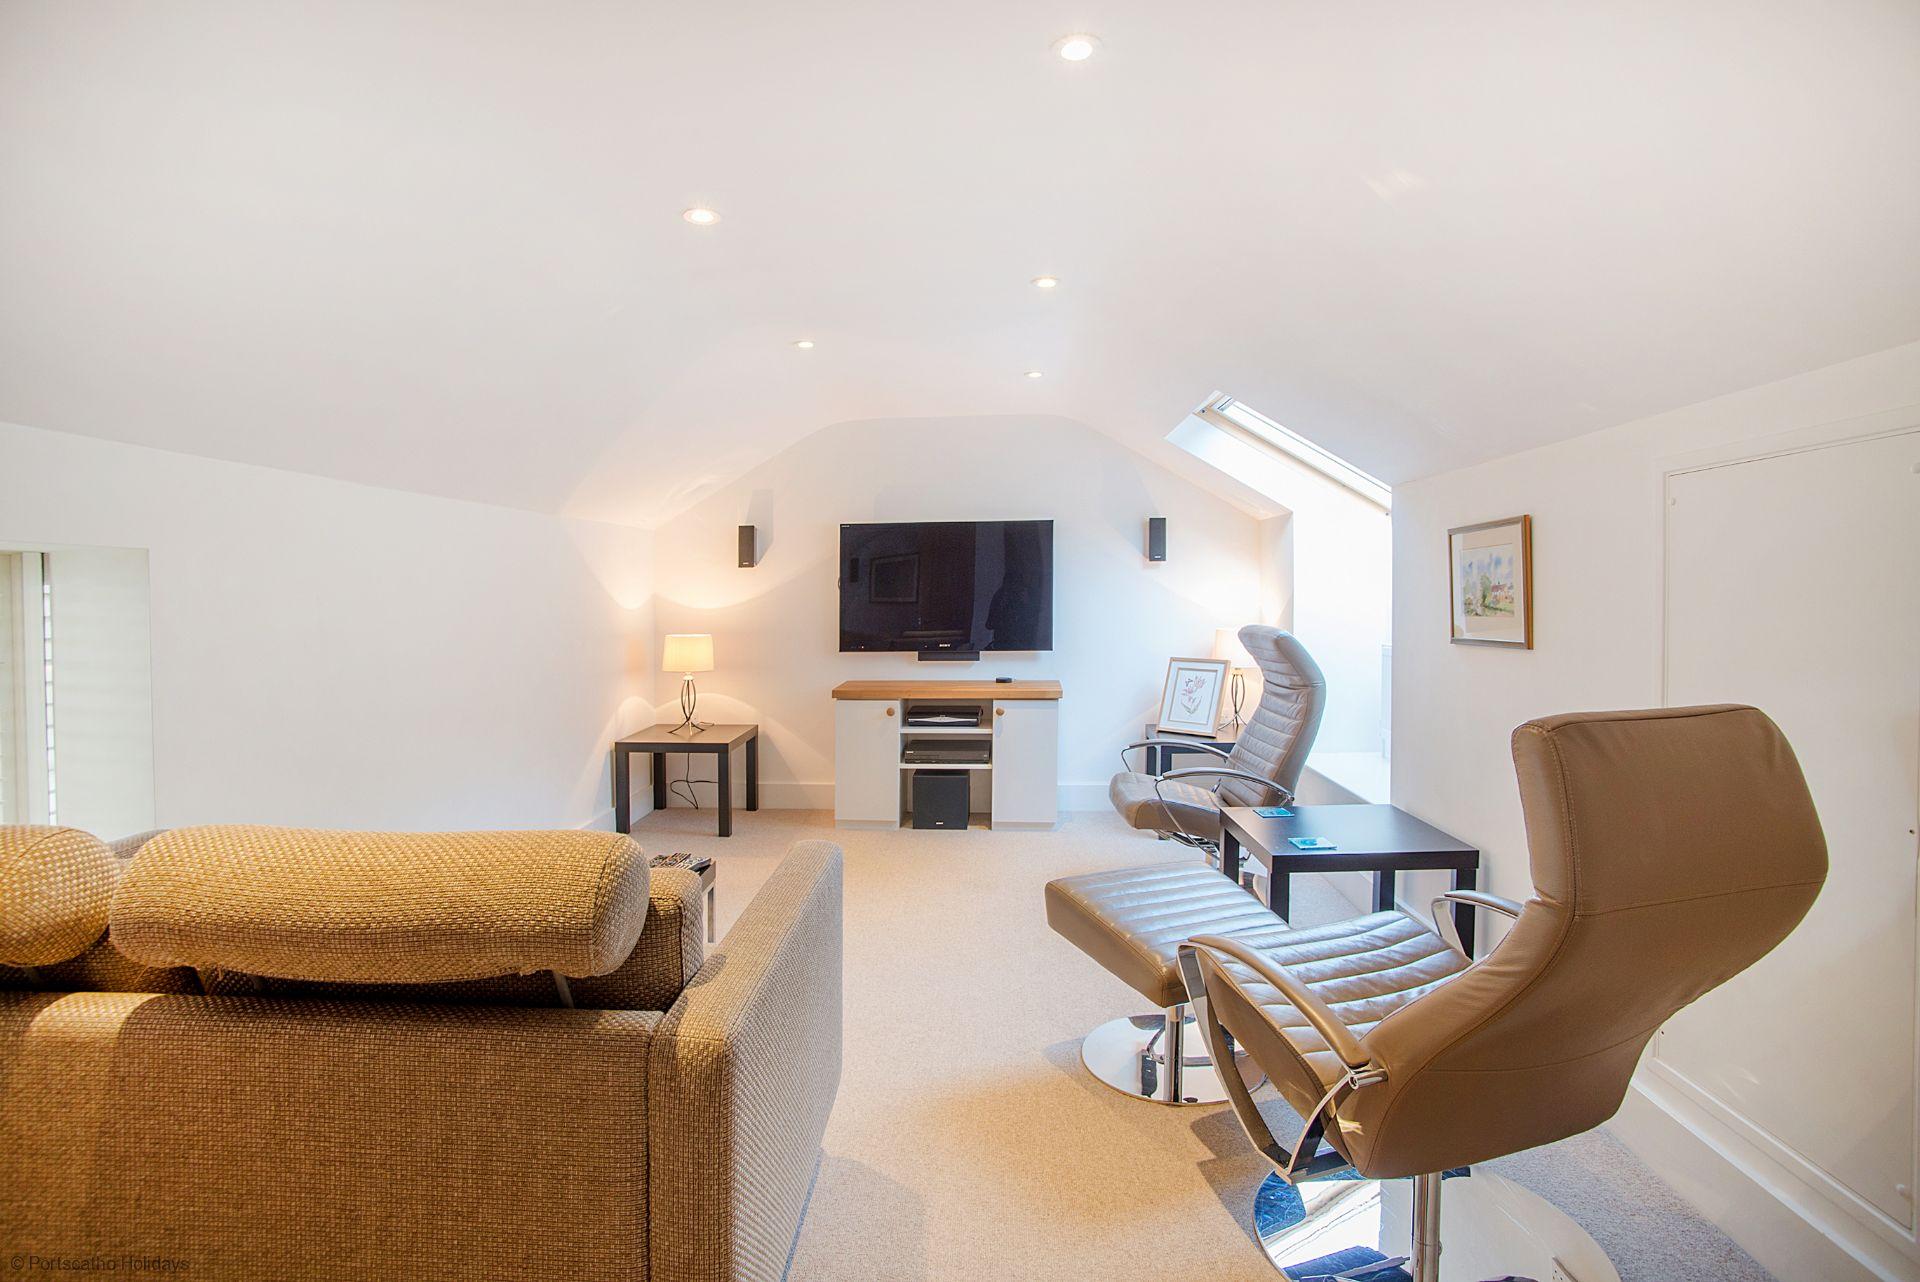 Tregwylan, St Mawes - Roseland & St Mawes cottages